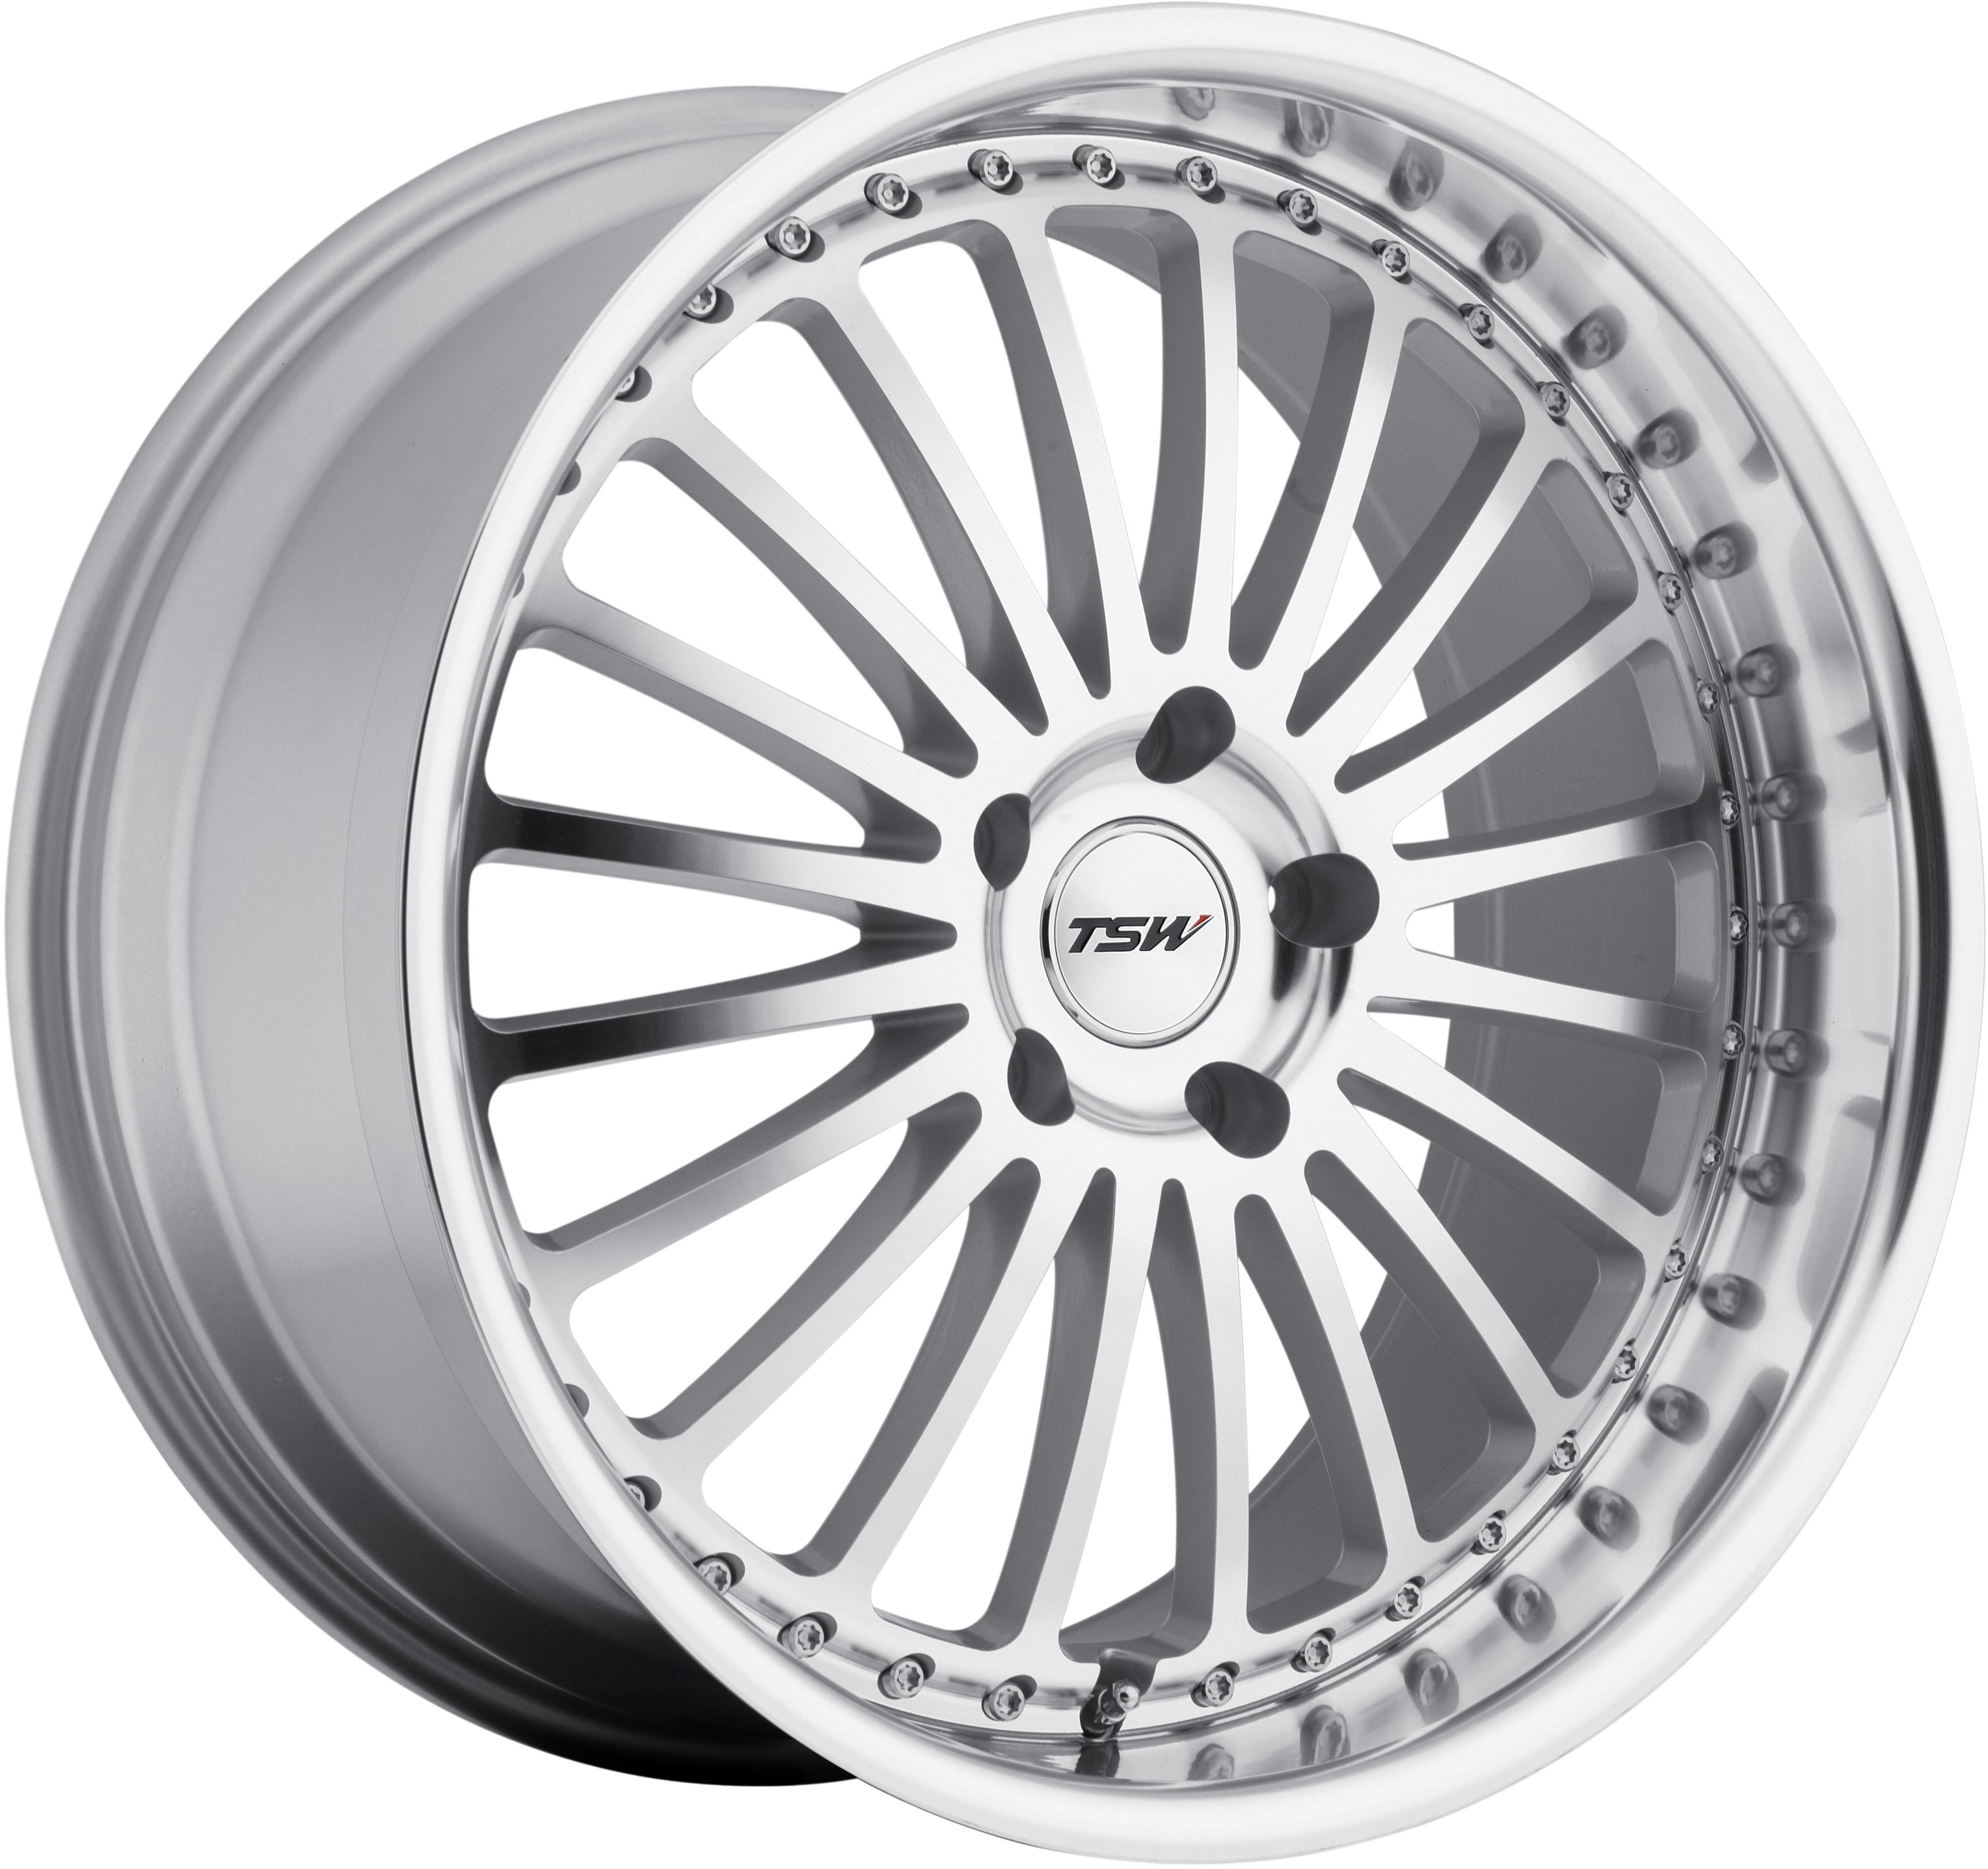 TSW - Silverstone (Silver / Mirror Cut Face & Lip)